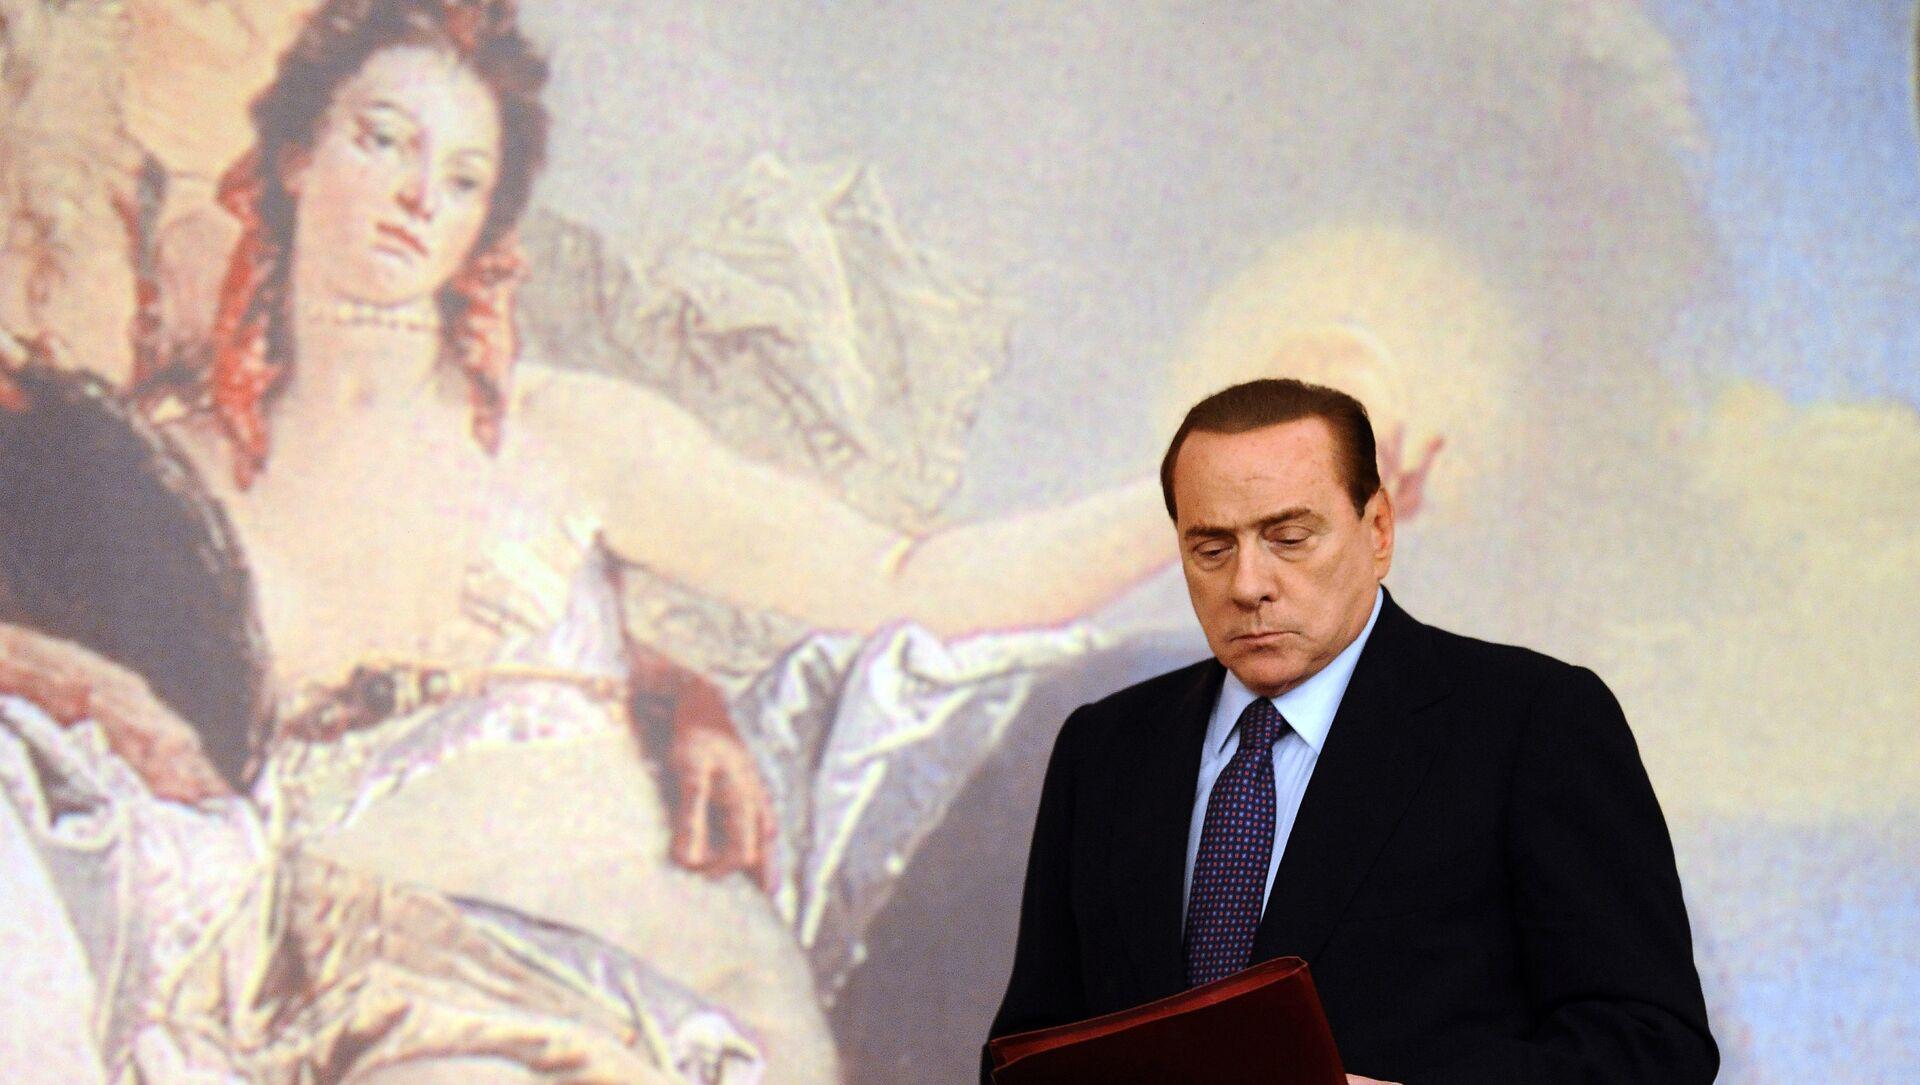 Ex primer ministro de Italia, Silvio Berlusconi - Sputnik Mundo, 1920, 11.04.2019